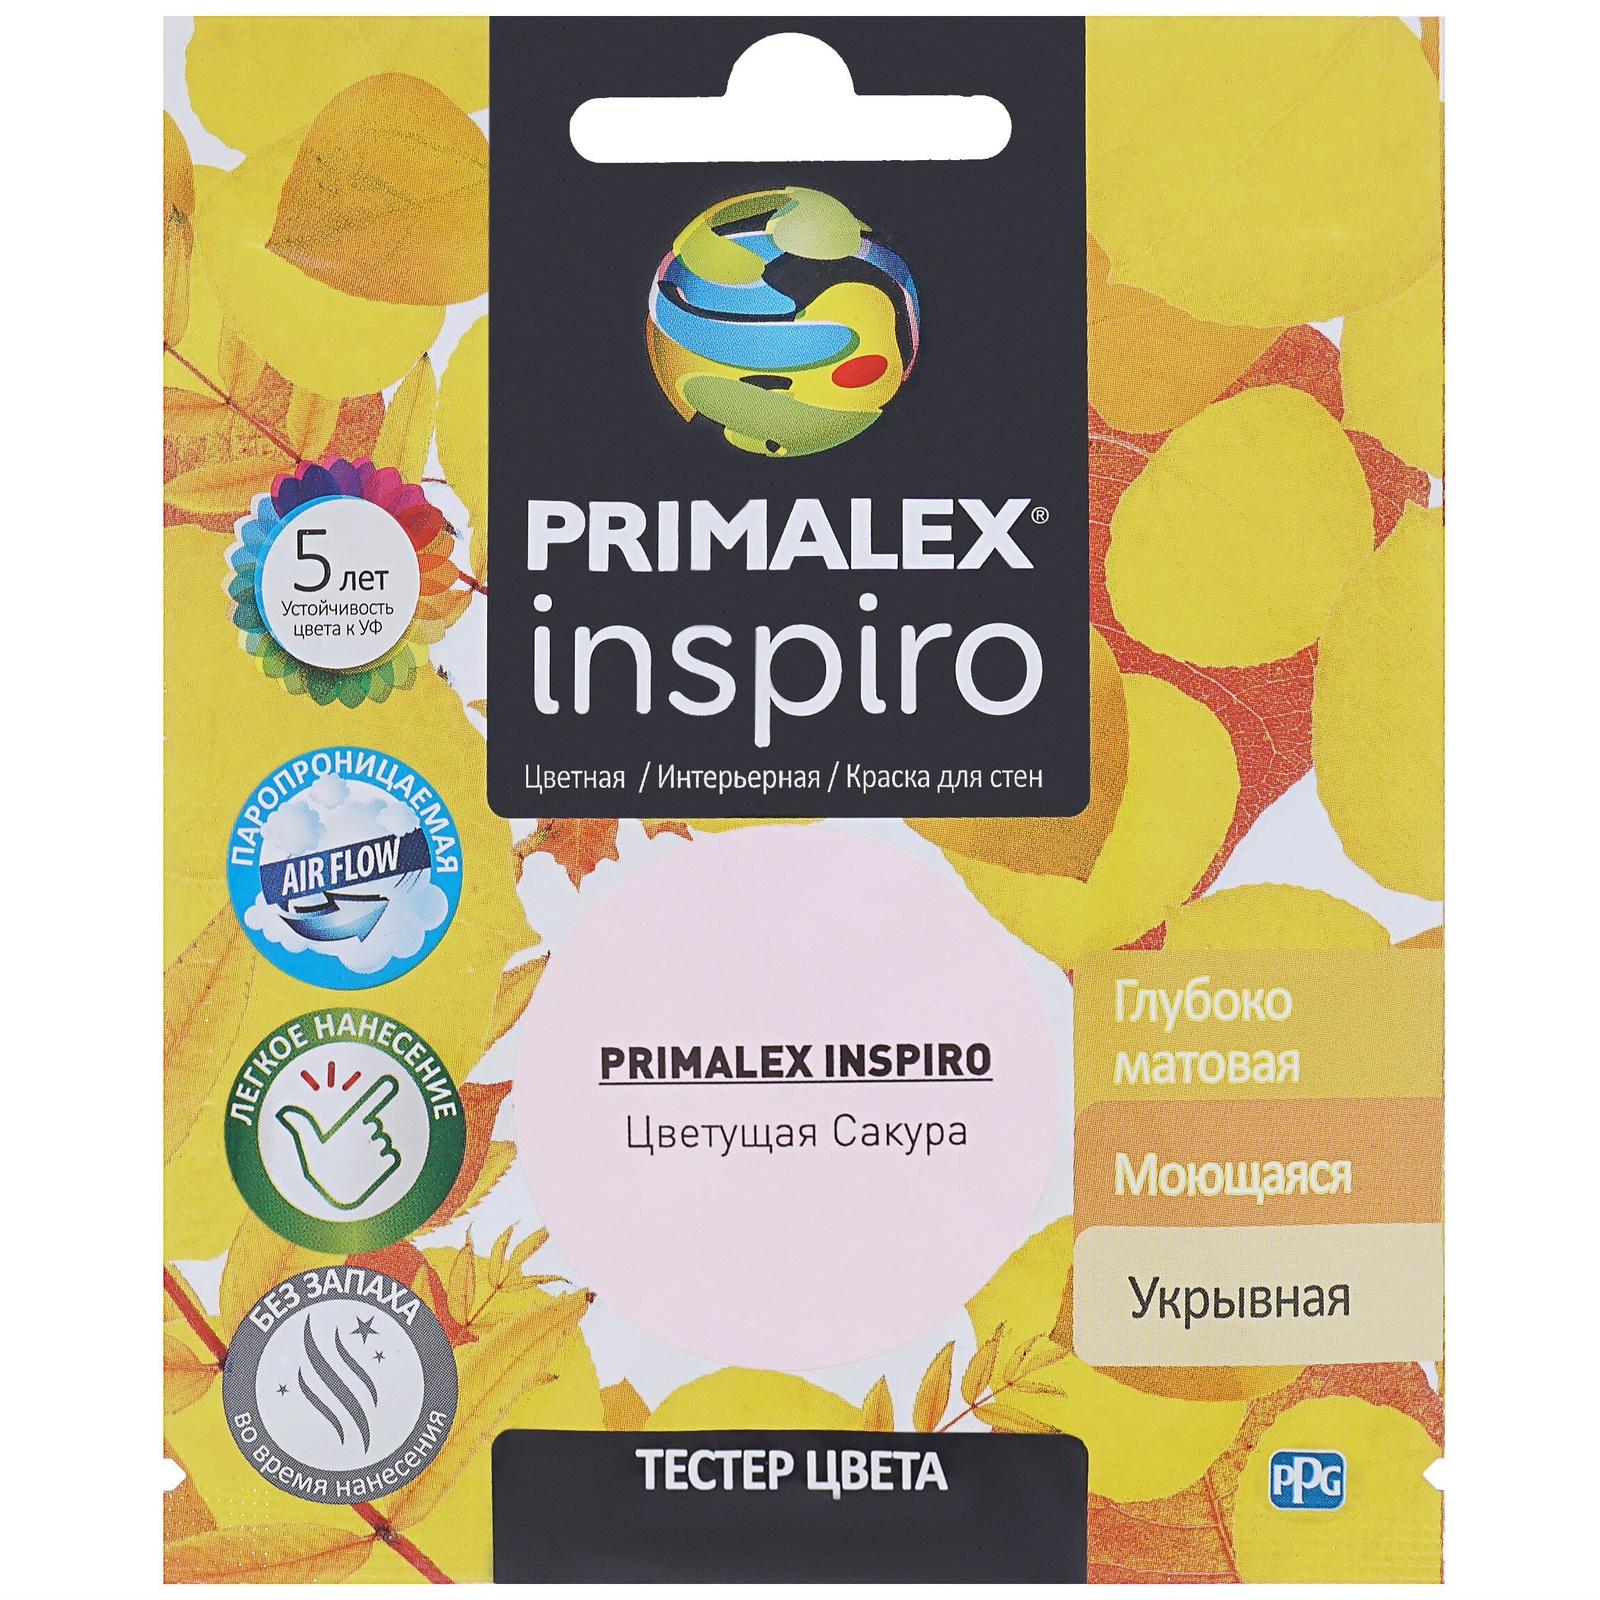 Краска PPG Primalex Inspiro Цветущая Сакура 40мл краска ppg primalex inspiro красный мак 40мл pmx i47